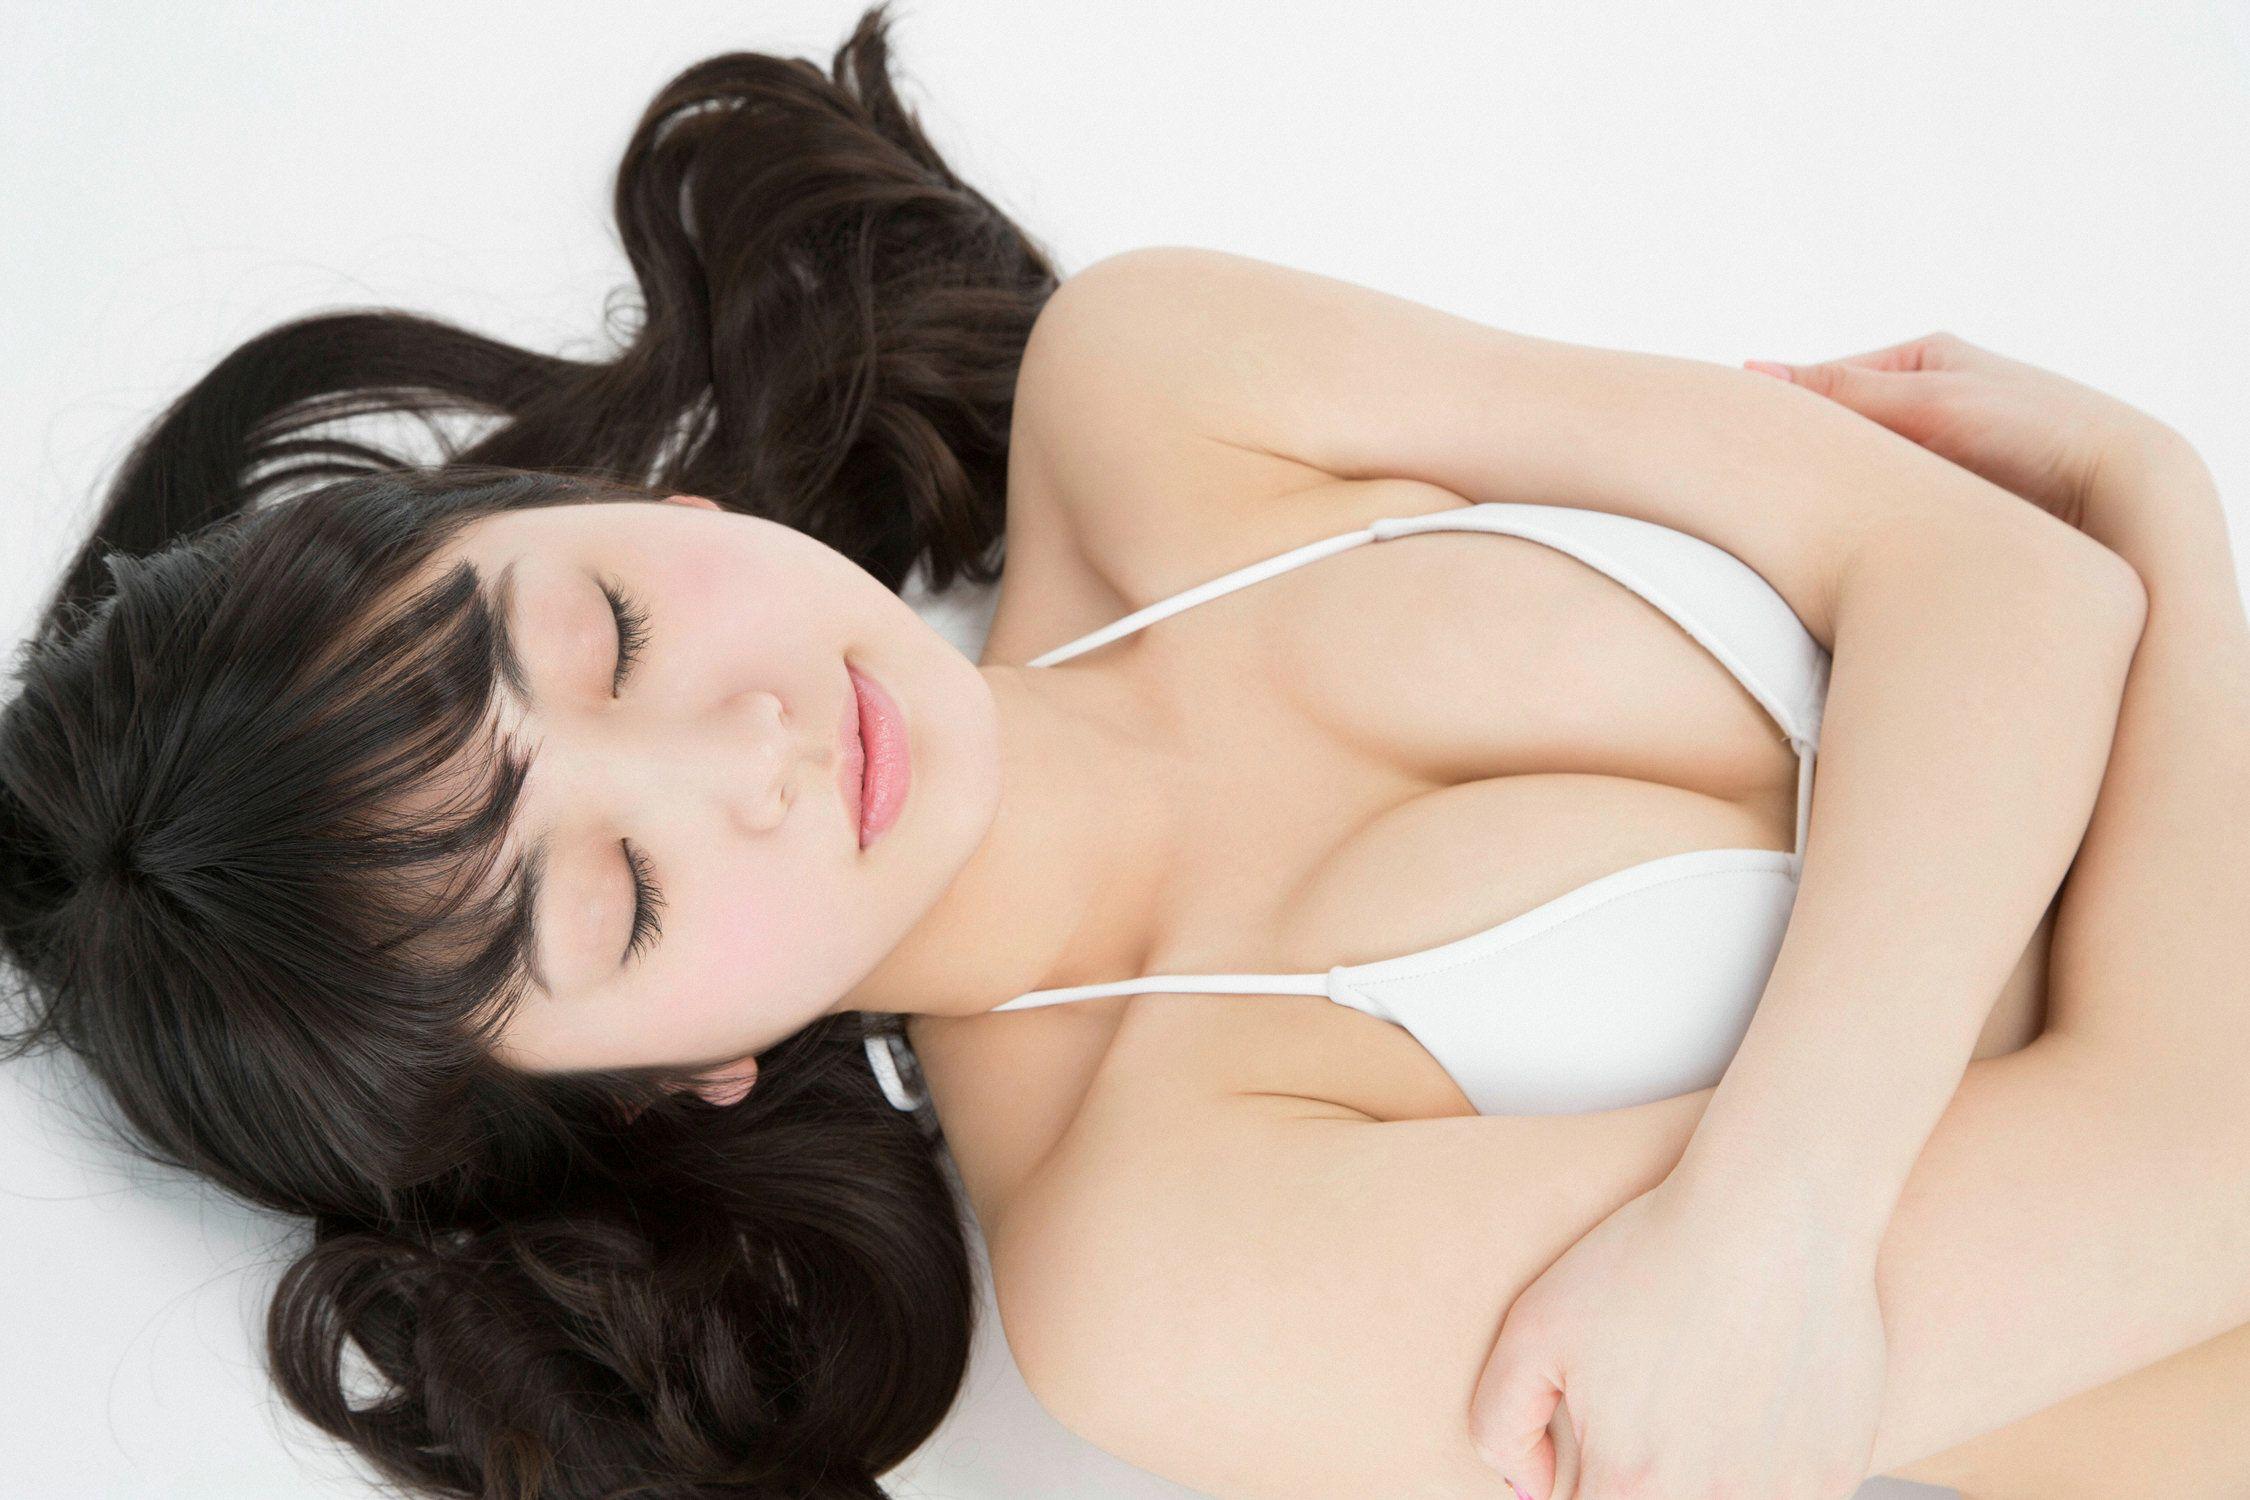 Paiarts muscular body Kanae Shiina 038